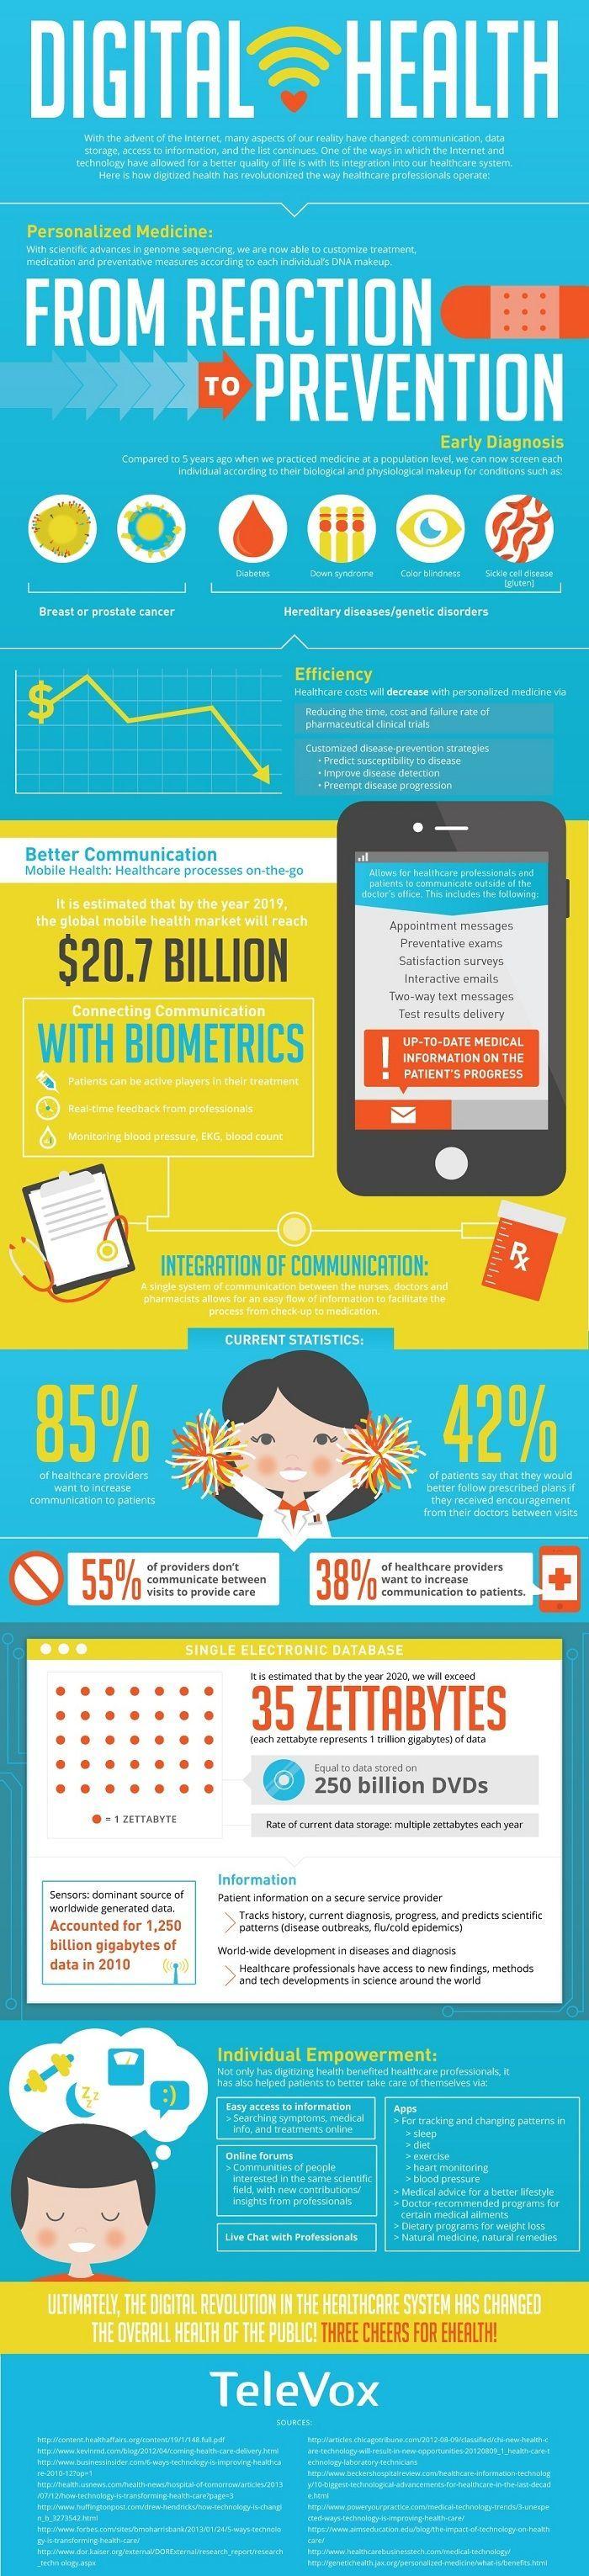 #digitalhealth #infographic